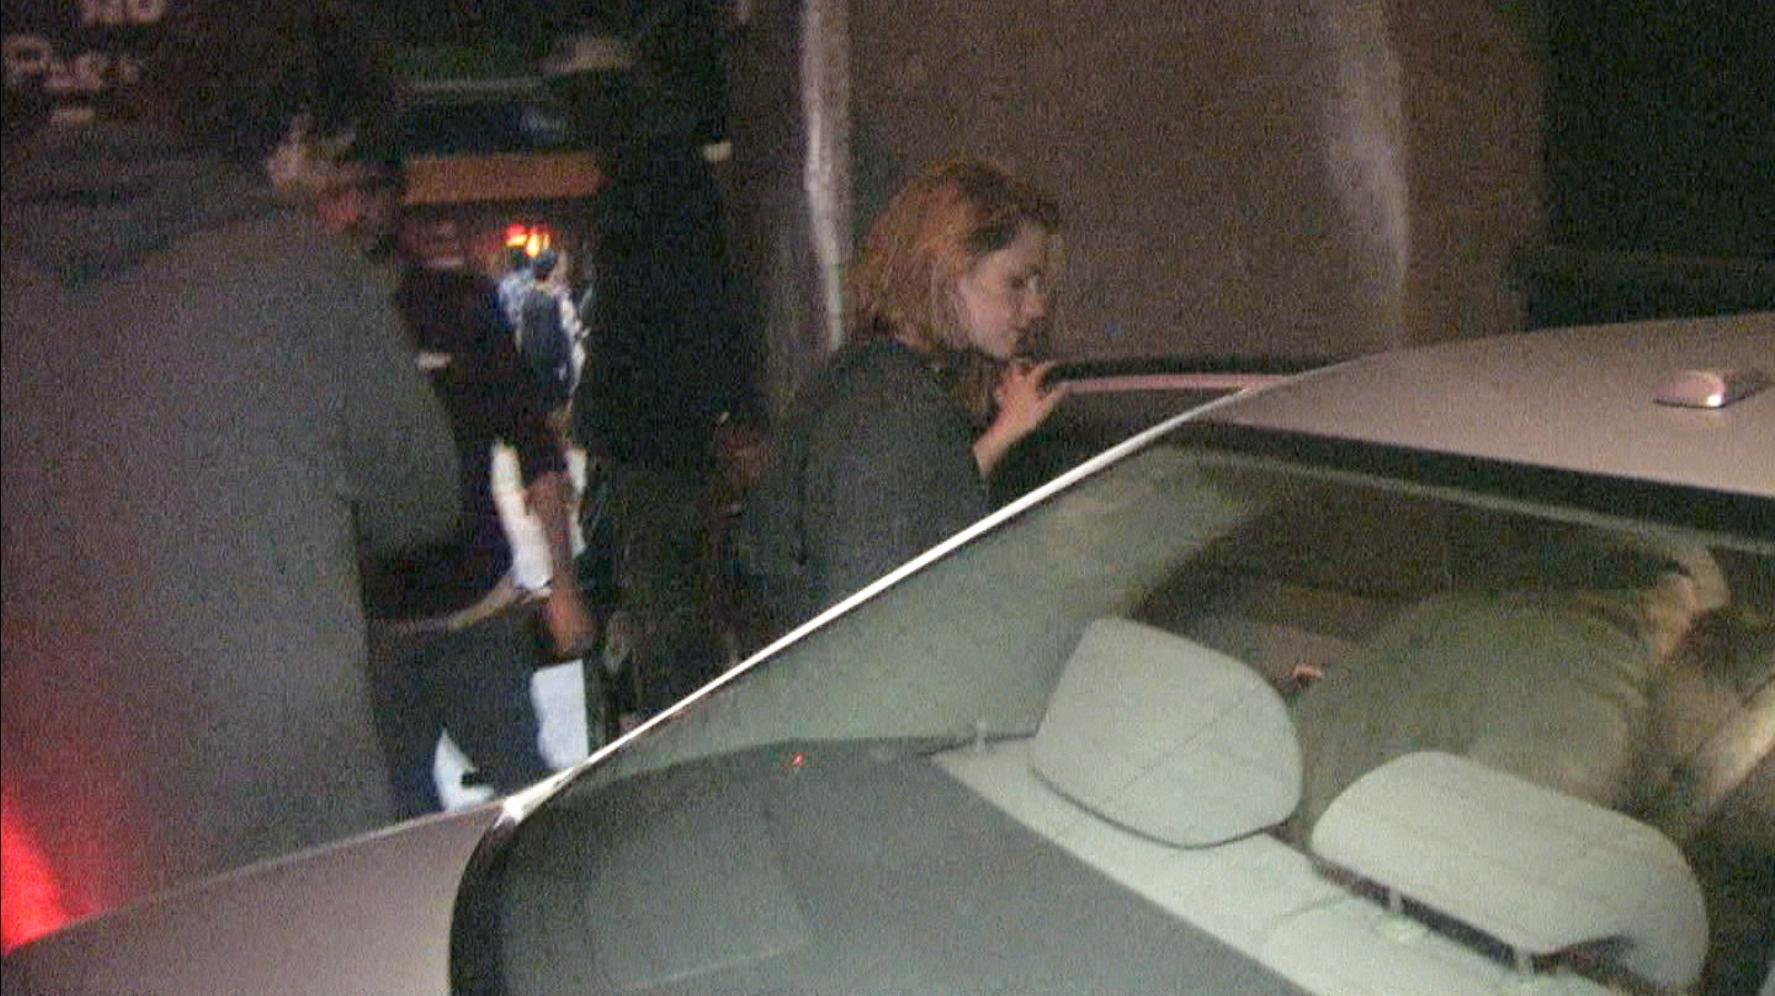 New pics of Rob & Kristen yesterday!